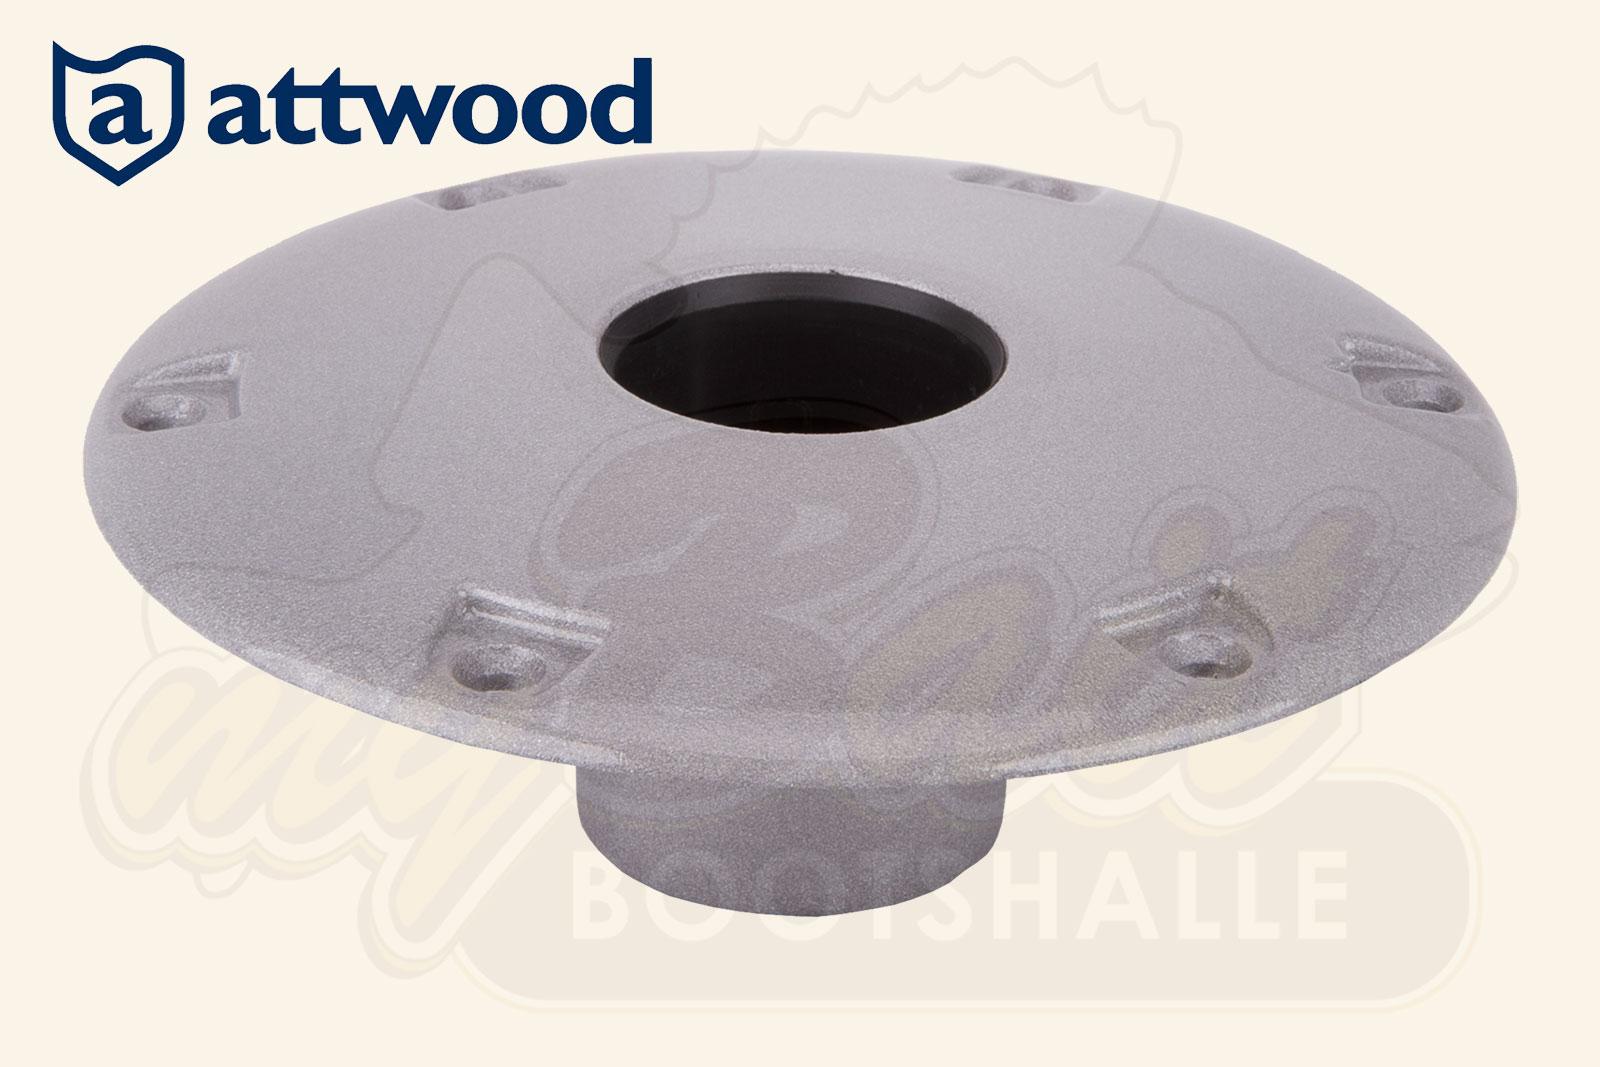 Swivl Eze Base Einbau Bodenplatte LakeSport 238 Serie Anodisiert